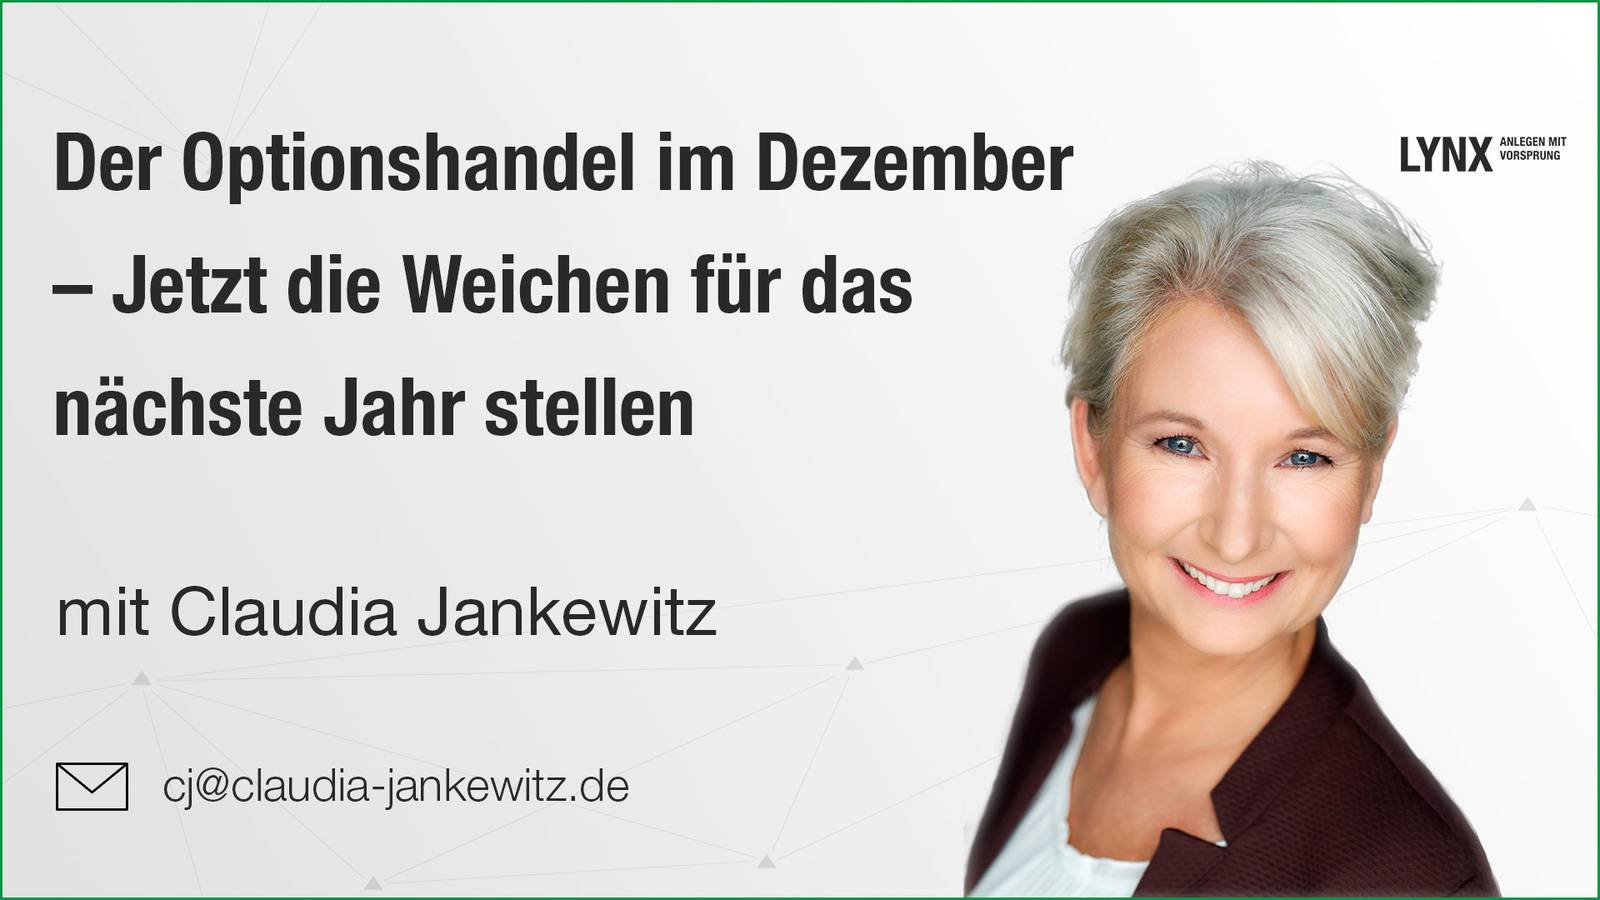 Der Optionshandel im Dezember - Webinar mit Claudia Jankewitz